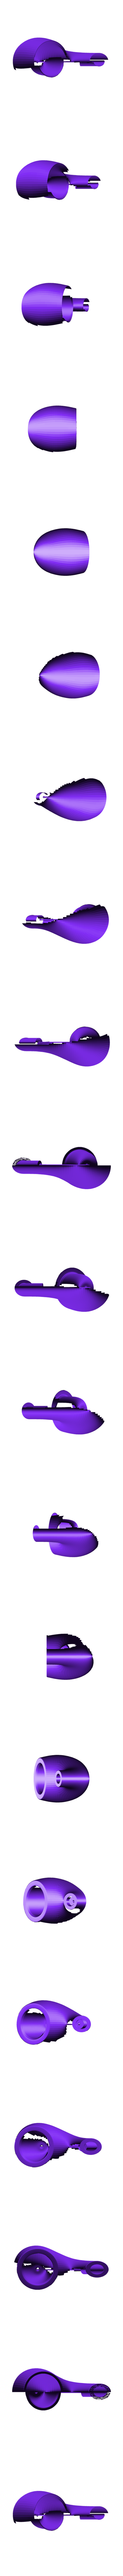 Pipe_2.stl Download free STL file Pipe • 3D printable object, meshtush